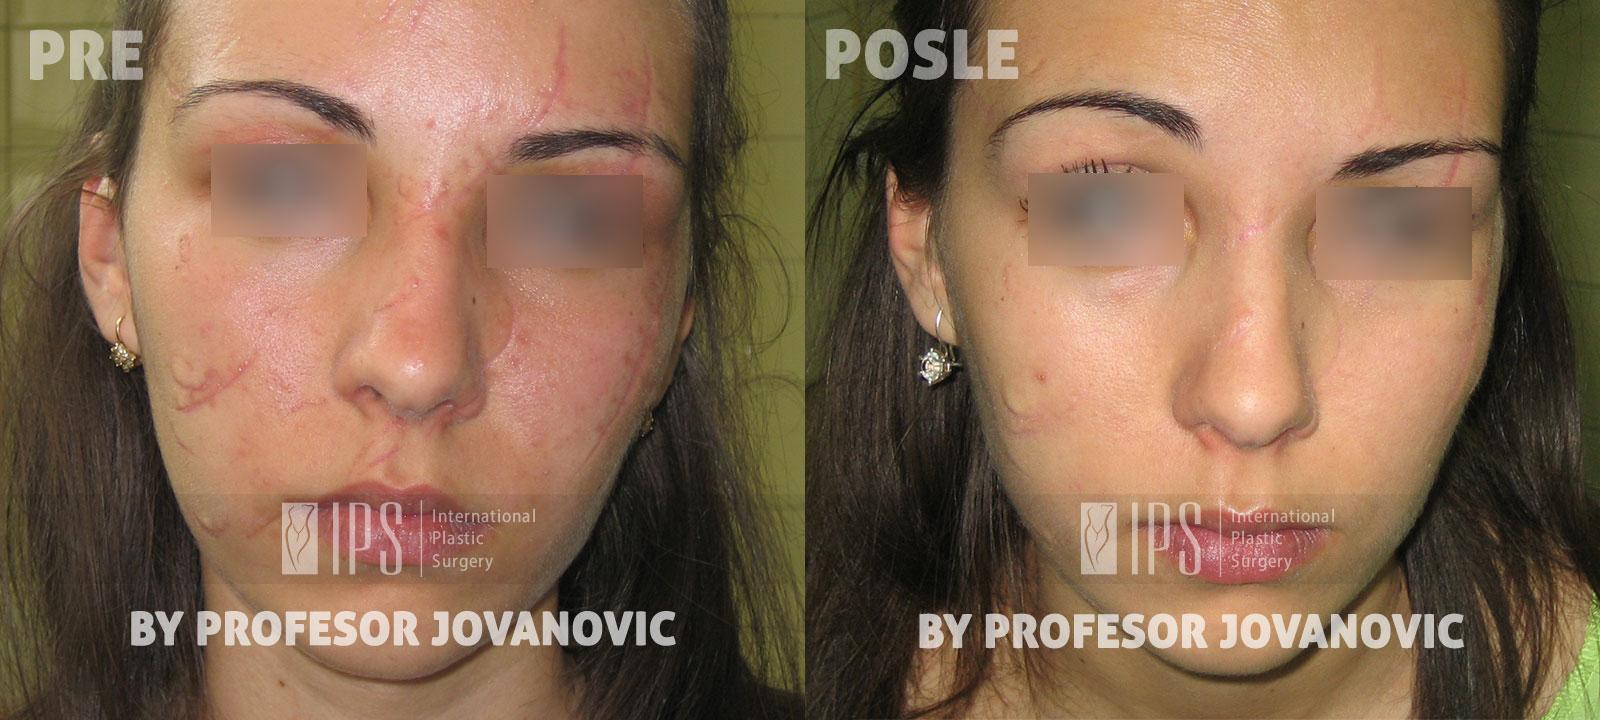 Korekcija ožiljaka - pre i posle